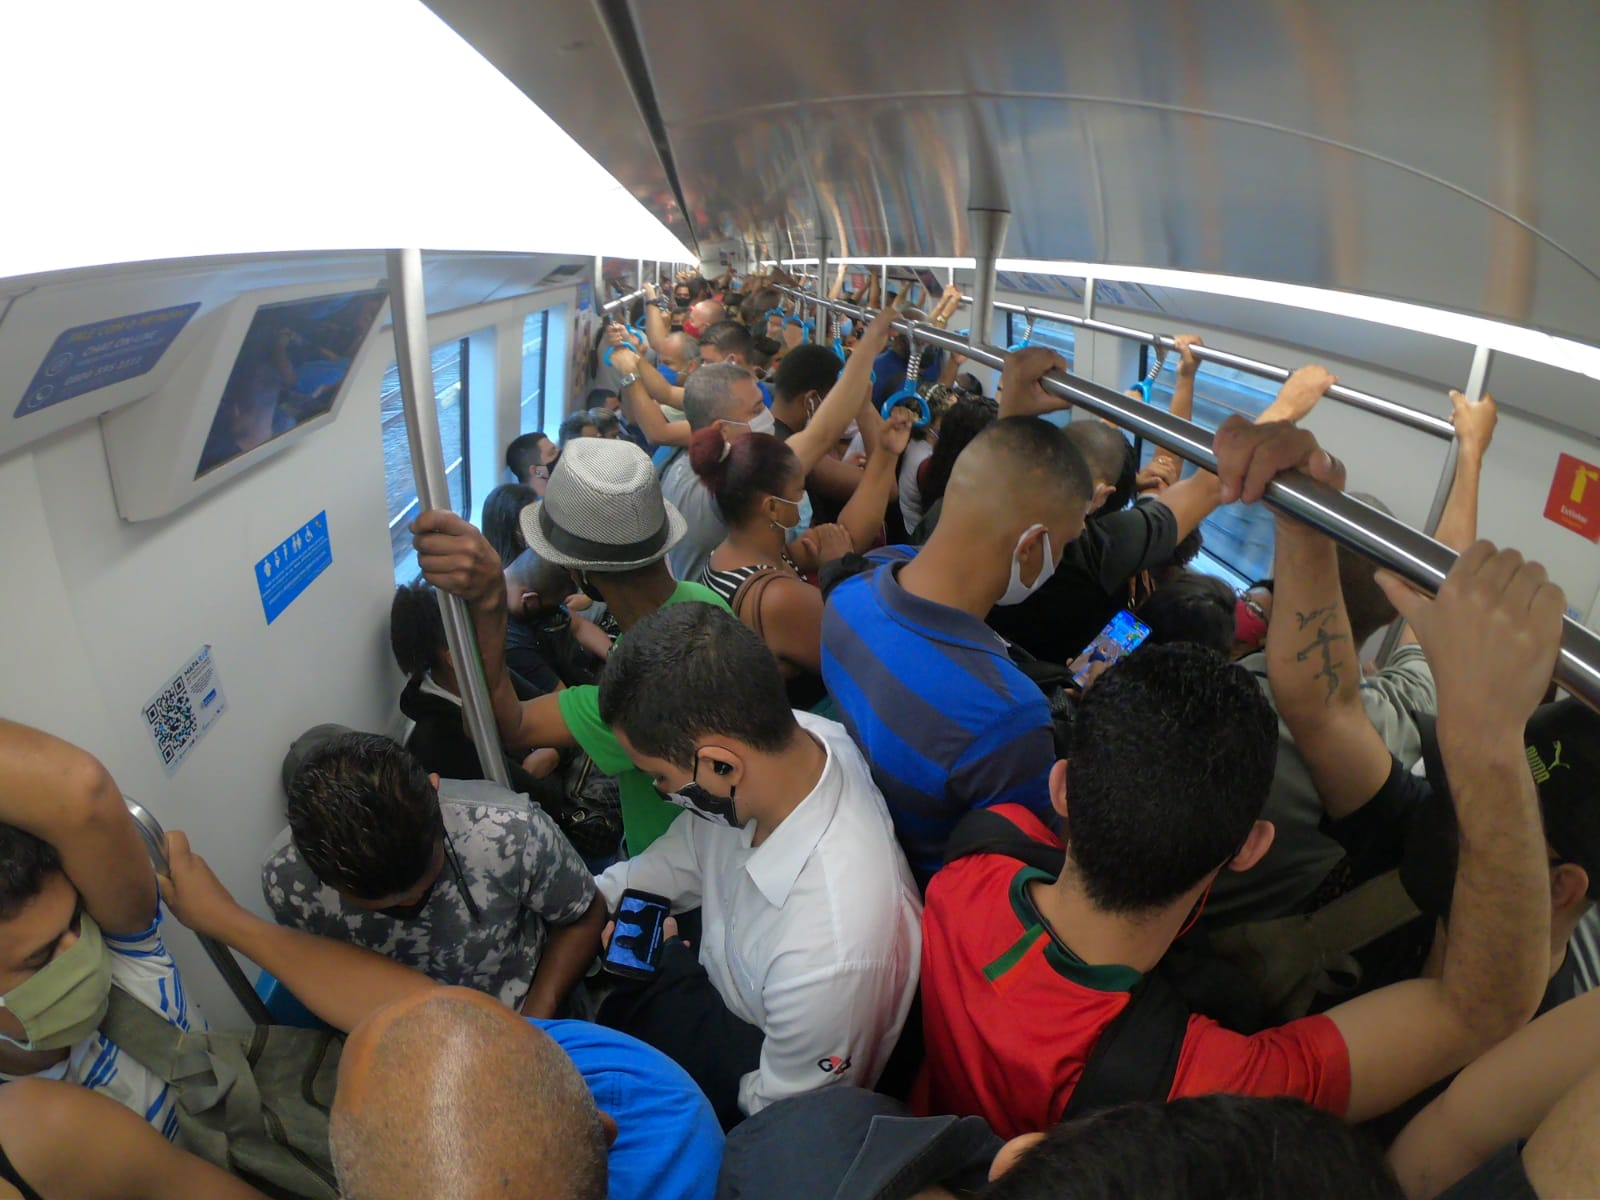 Metrô lotado no Rio